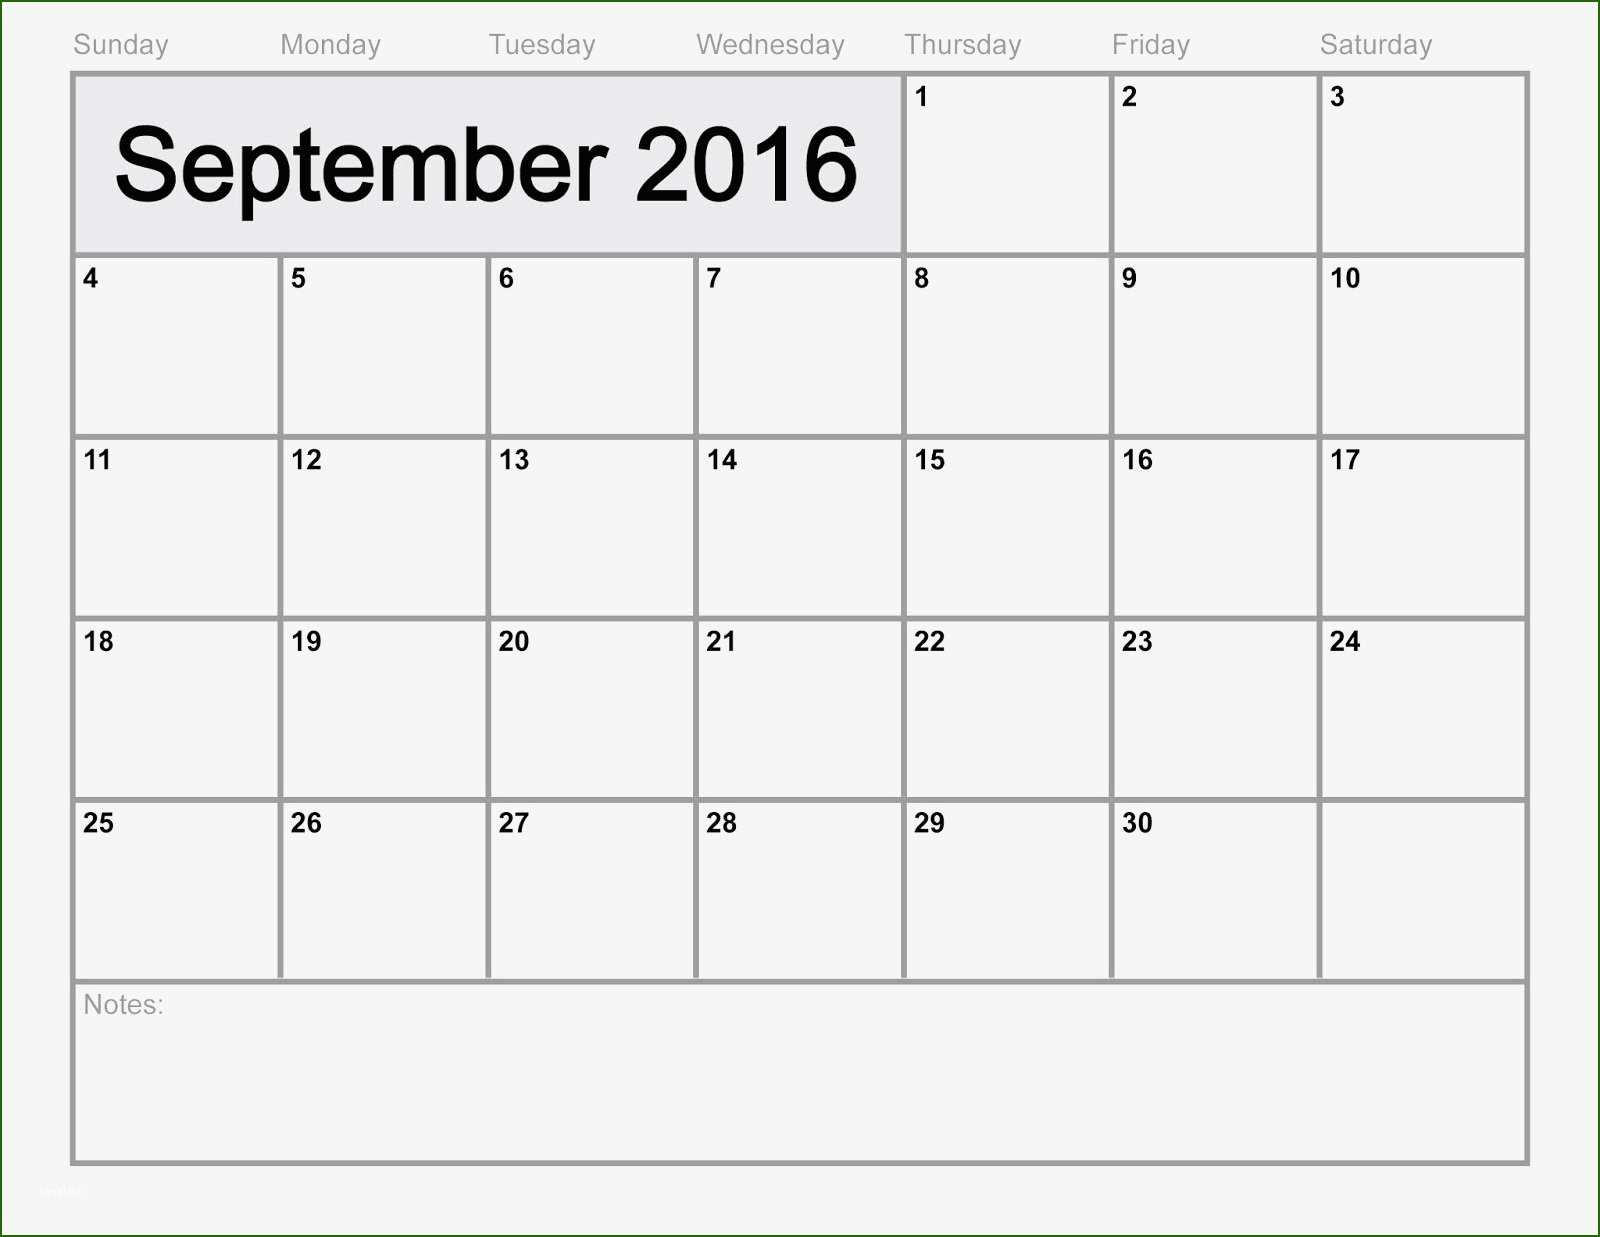 17 Exquisite September 2016 Calendar Template That Prove